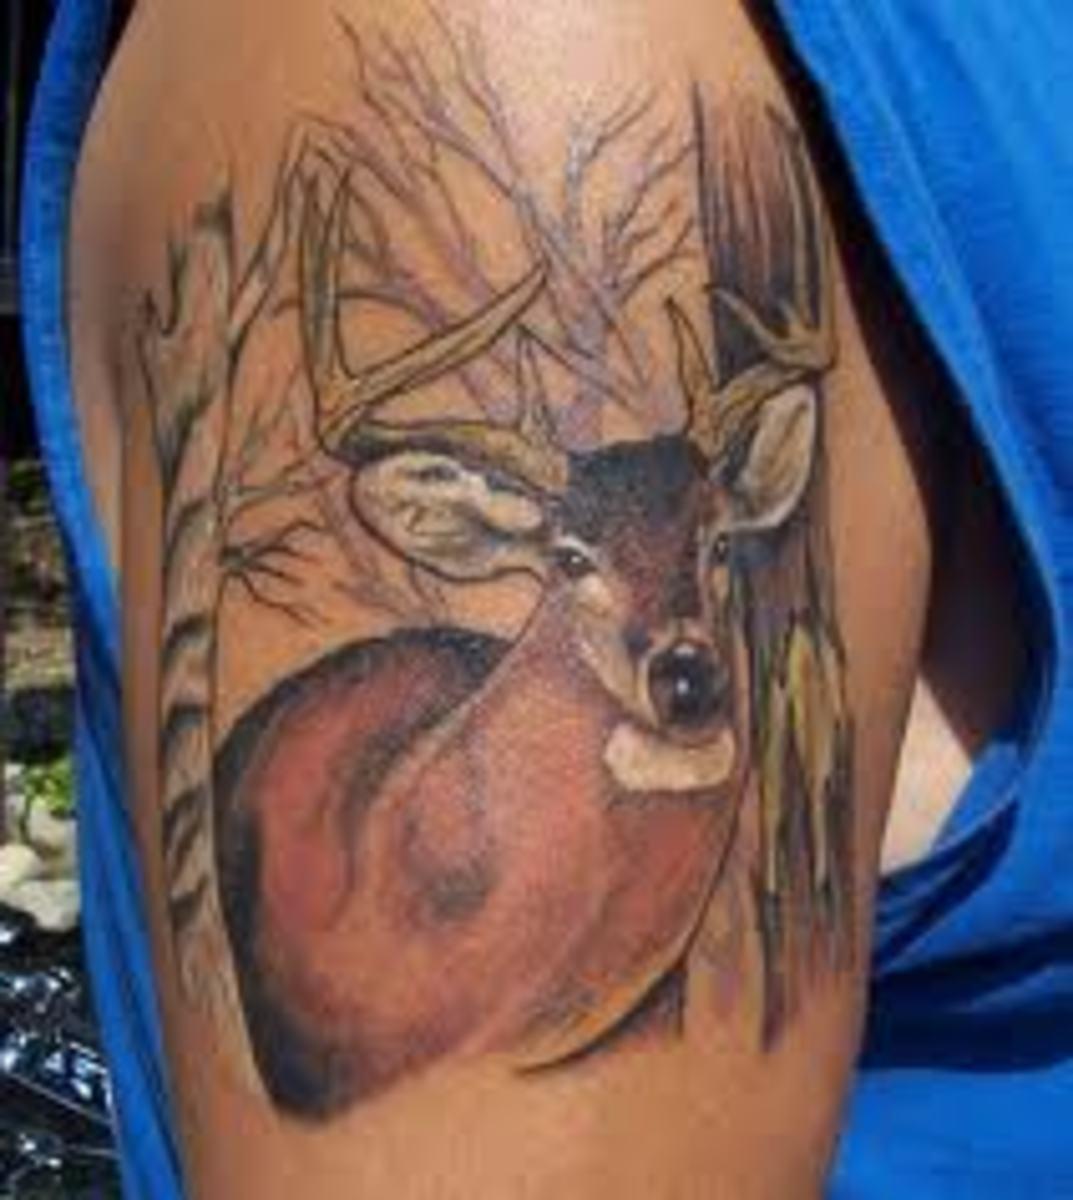 04e5514f0b62a Deer Tattoos And Meanings-Deer Skull Tattoos And Meanings-Deer Tattoo Ideas  And Pictures